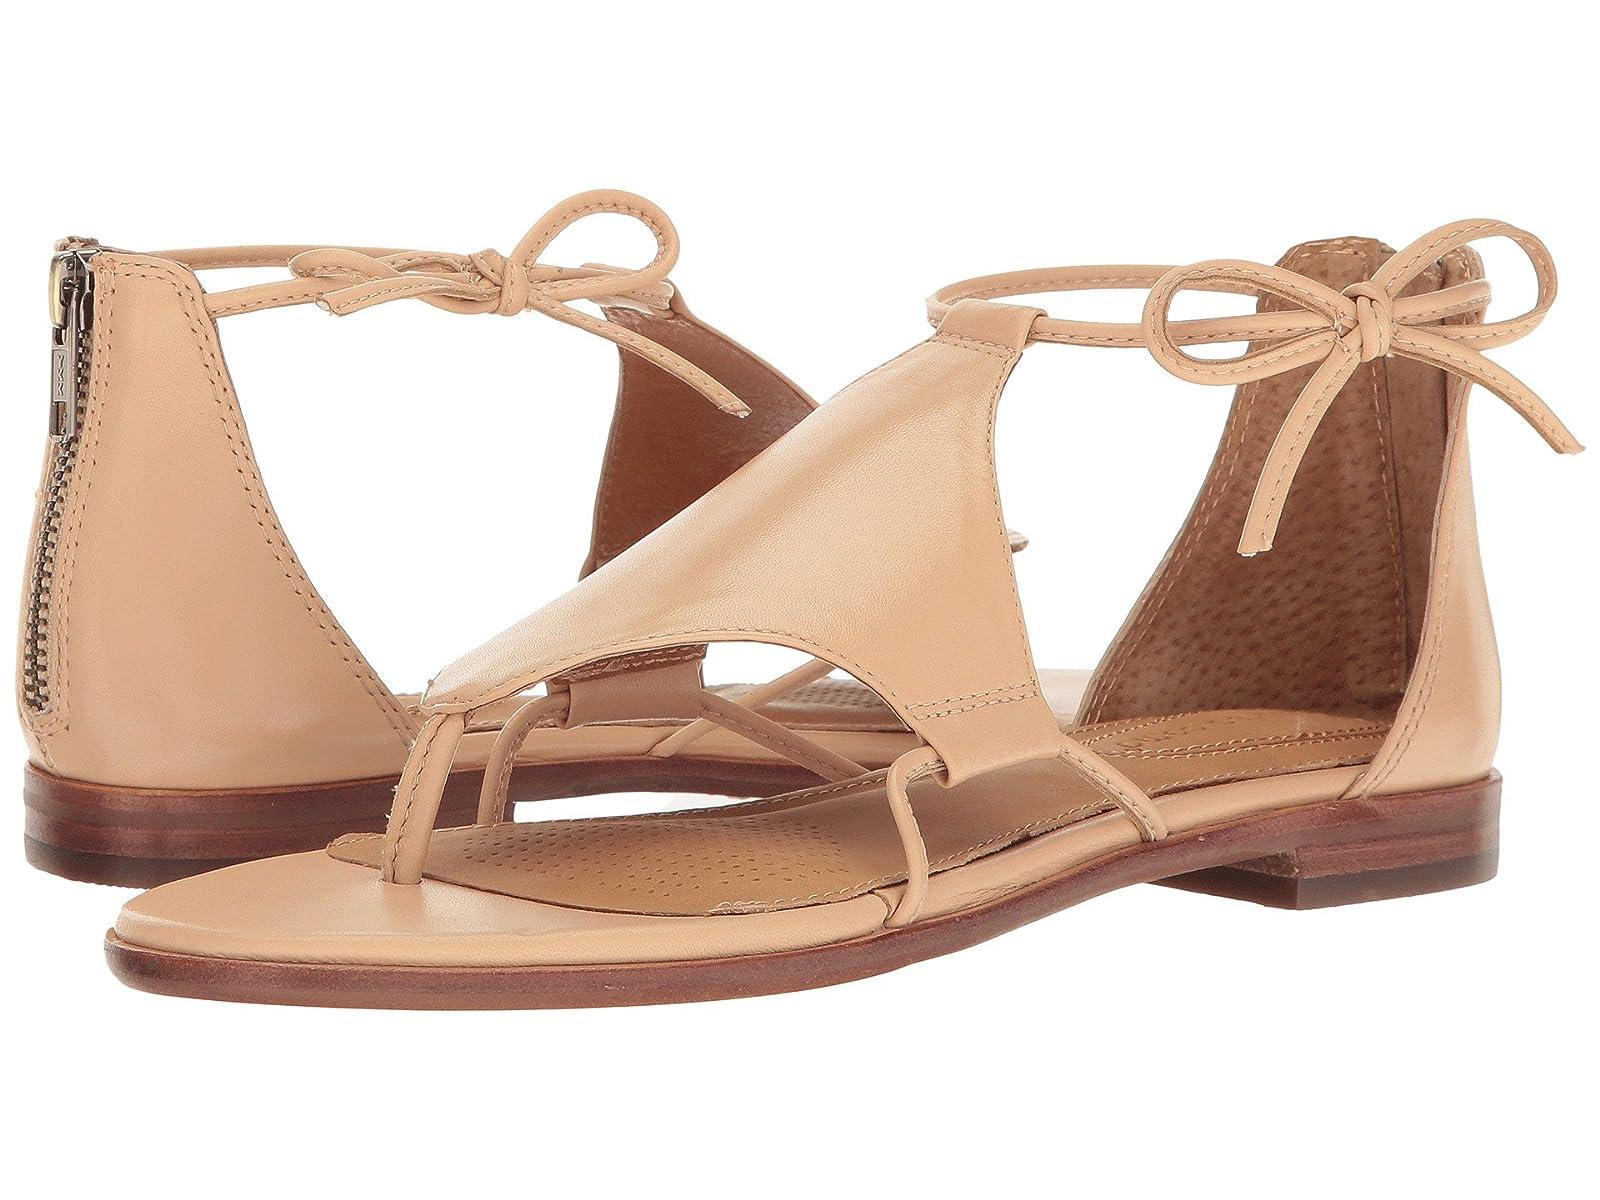 CC Corso Como SunsetCheap and distinctive eye-catching shoes